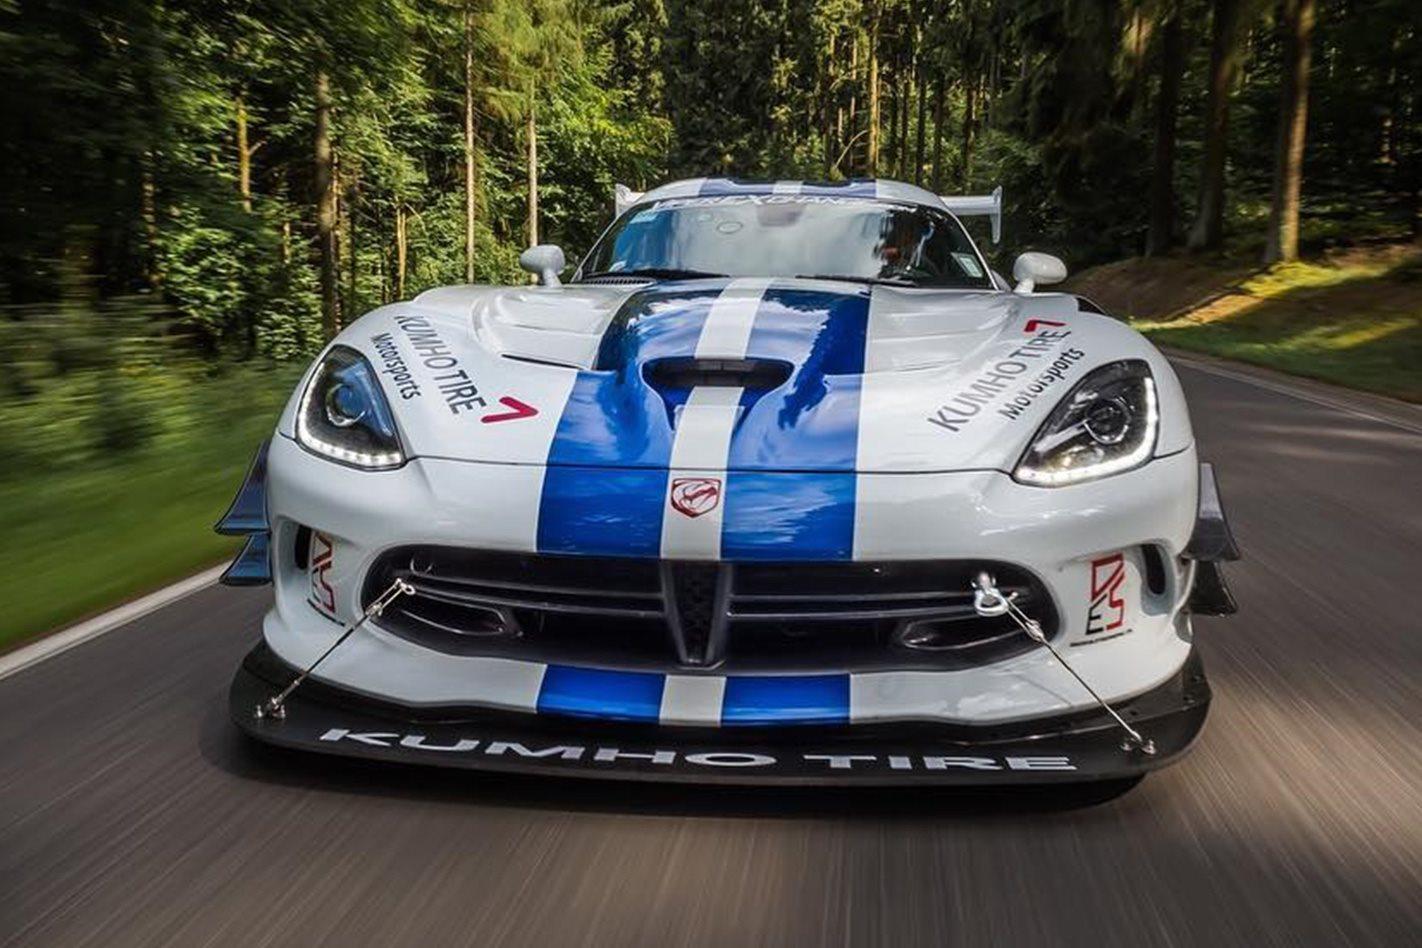 Dodge Viper ACR front